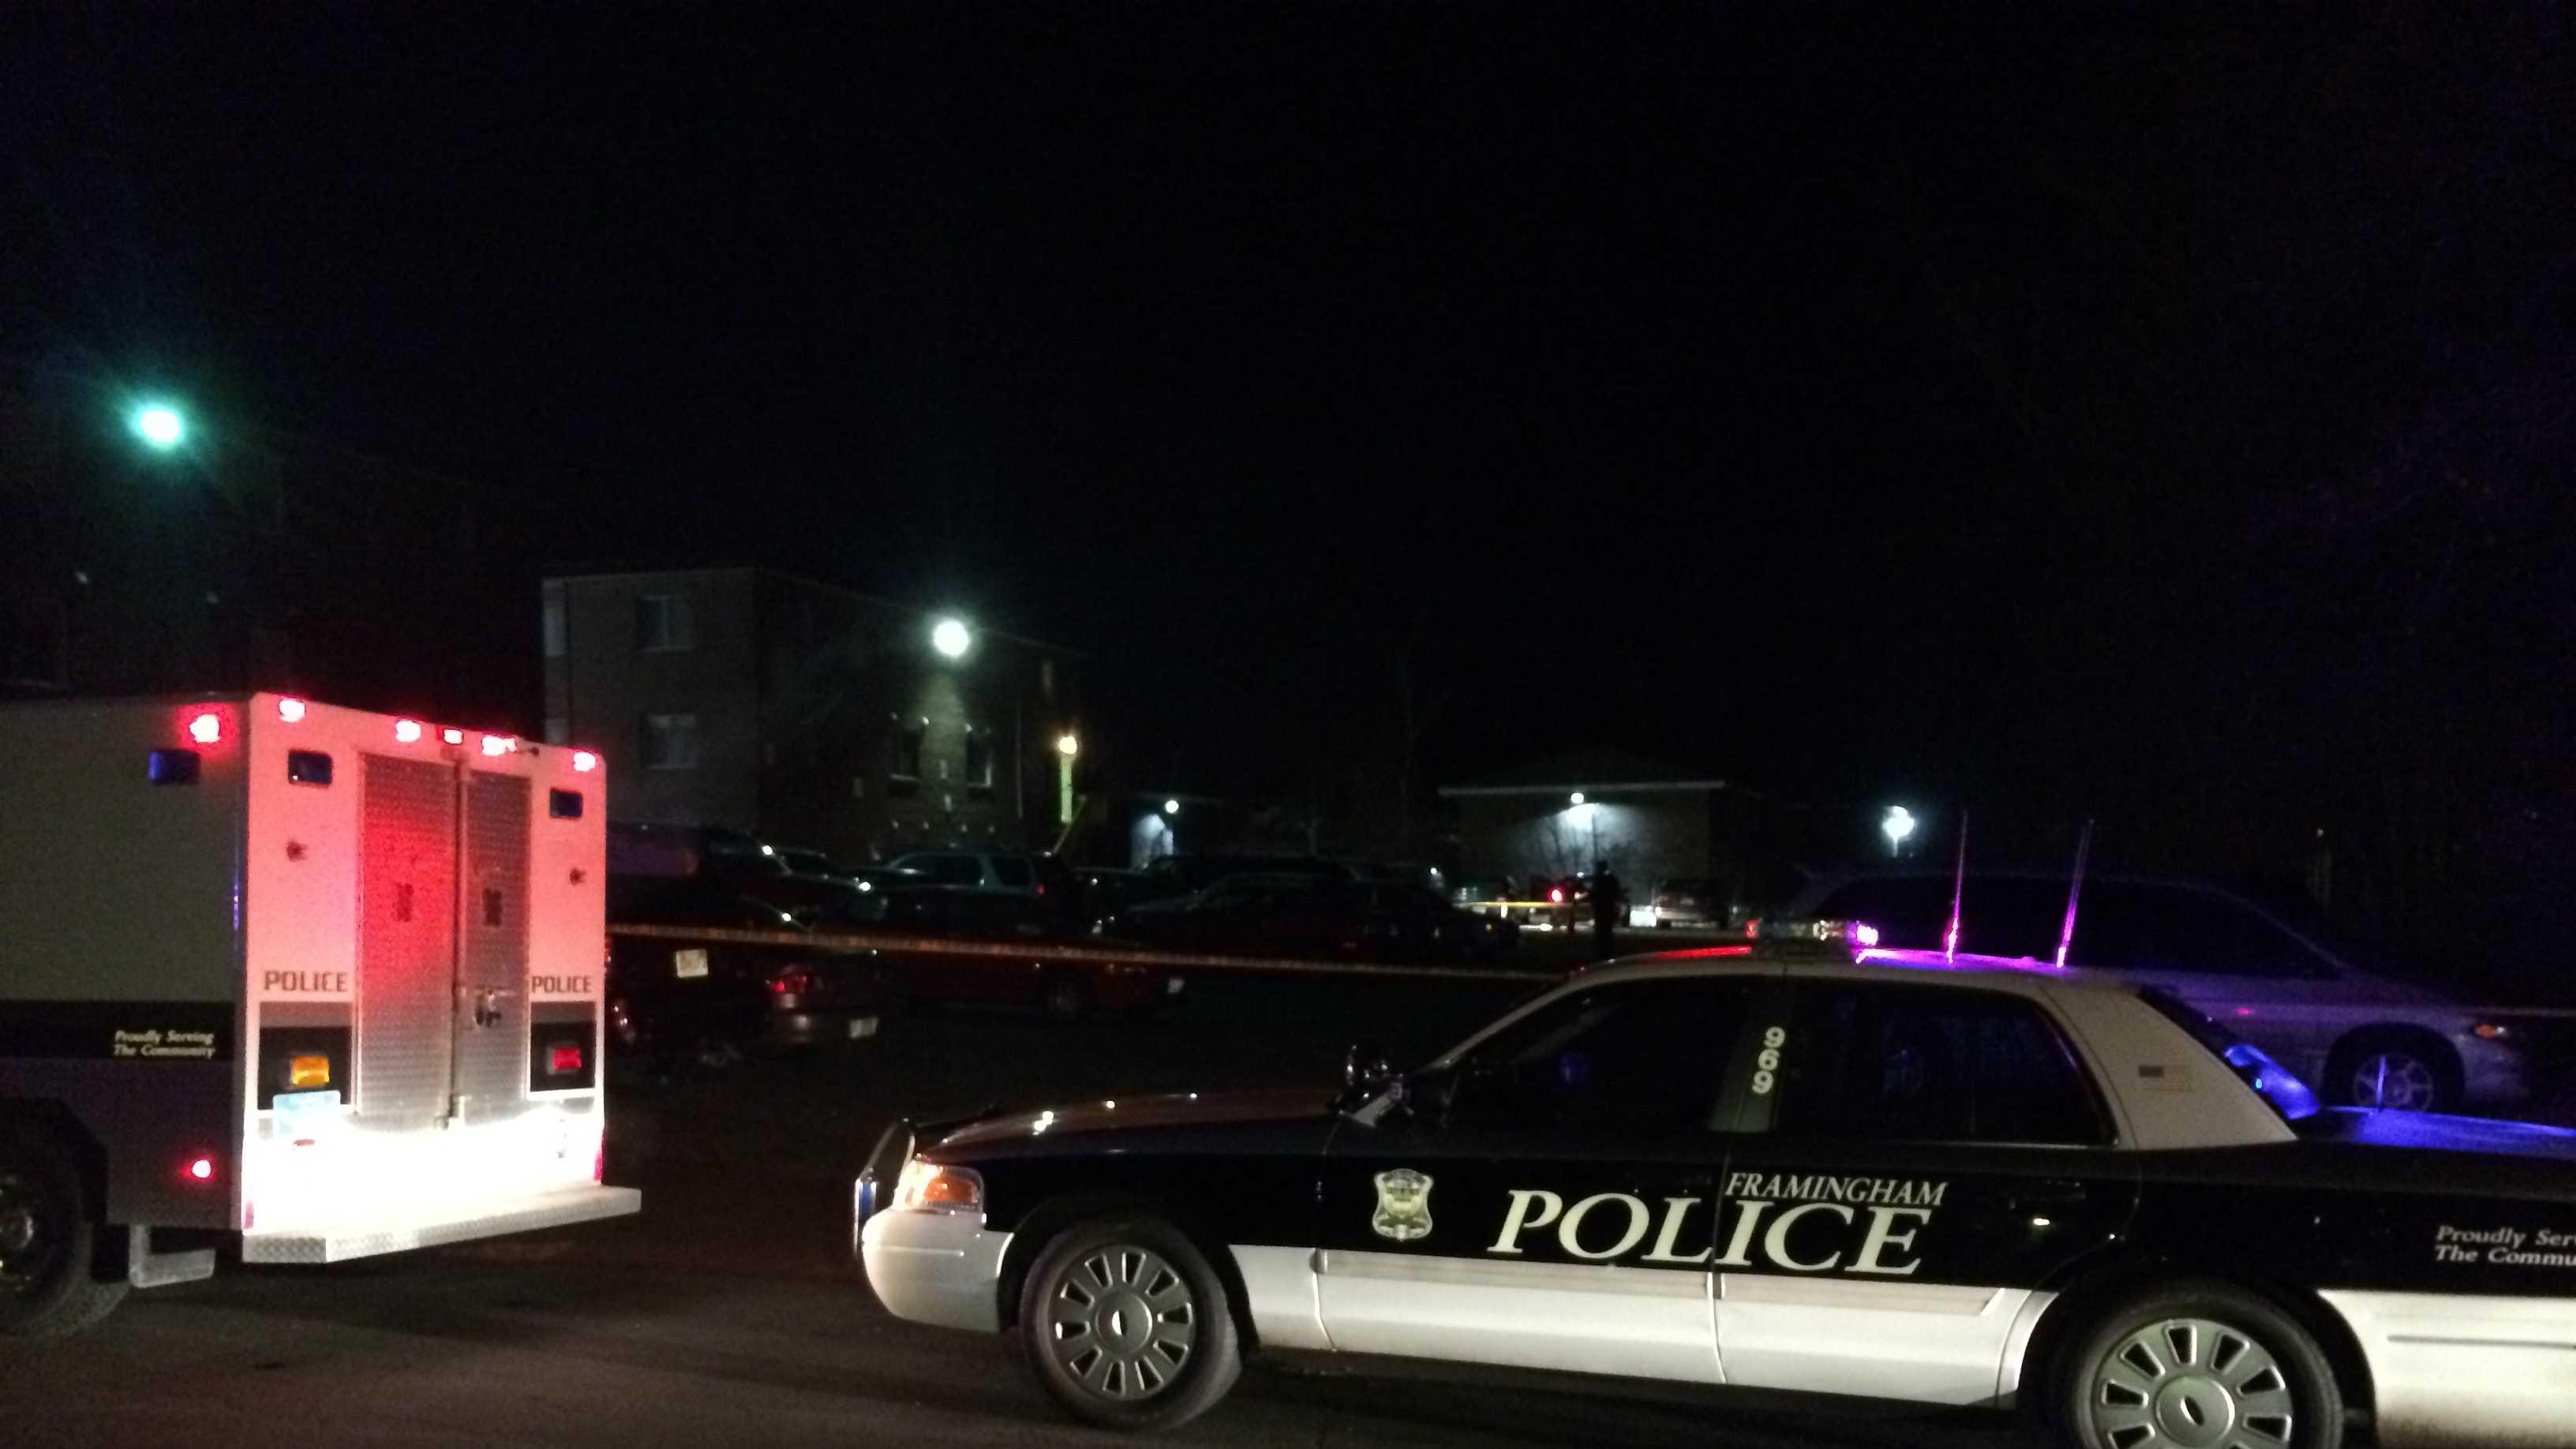 1 dead in Framingham shooting